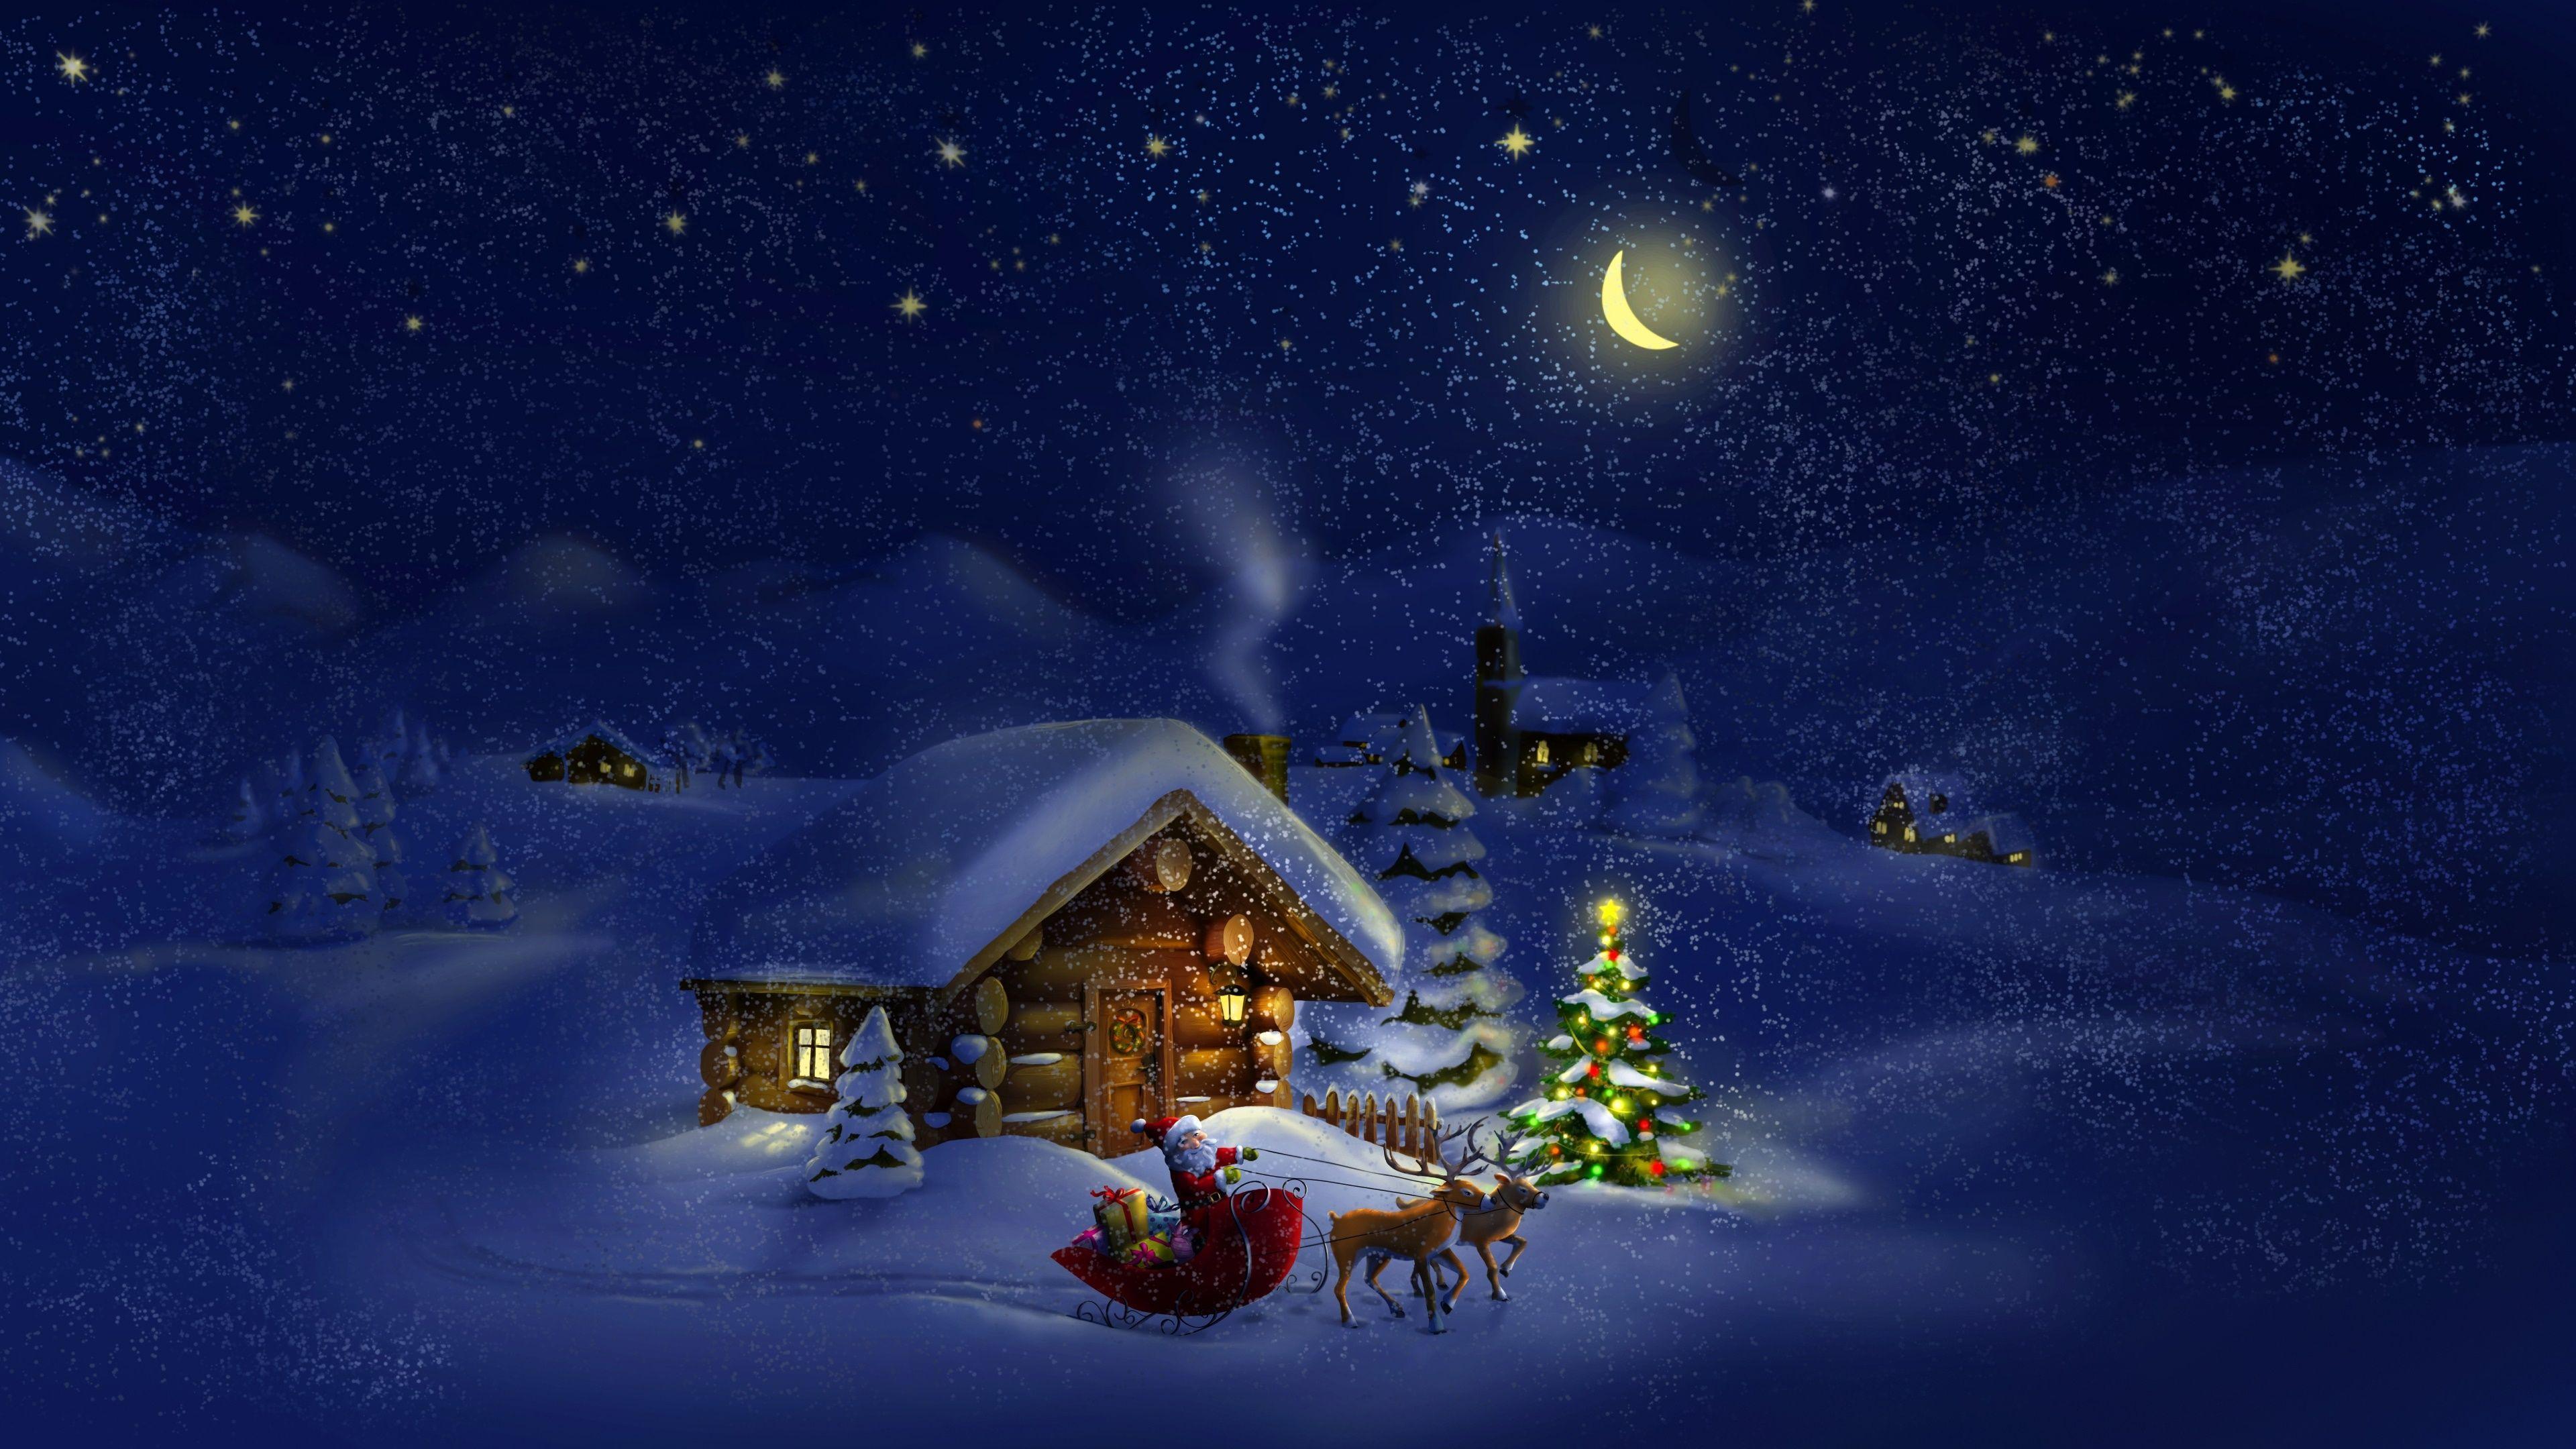 3840 X 2160 Christmas Wallpapers - Top Free 3840 X 2160 ...